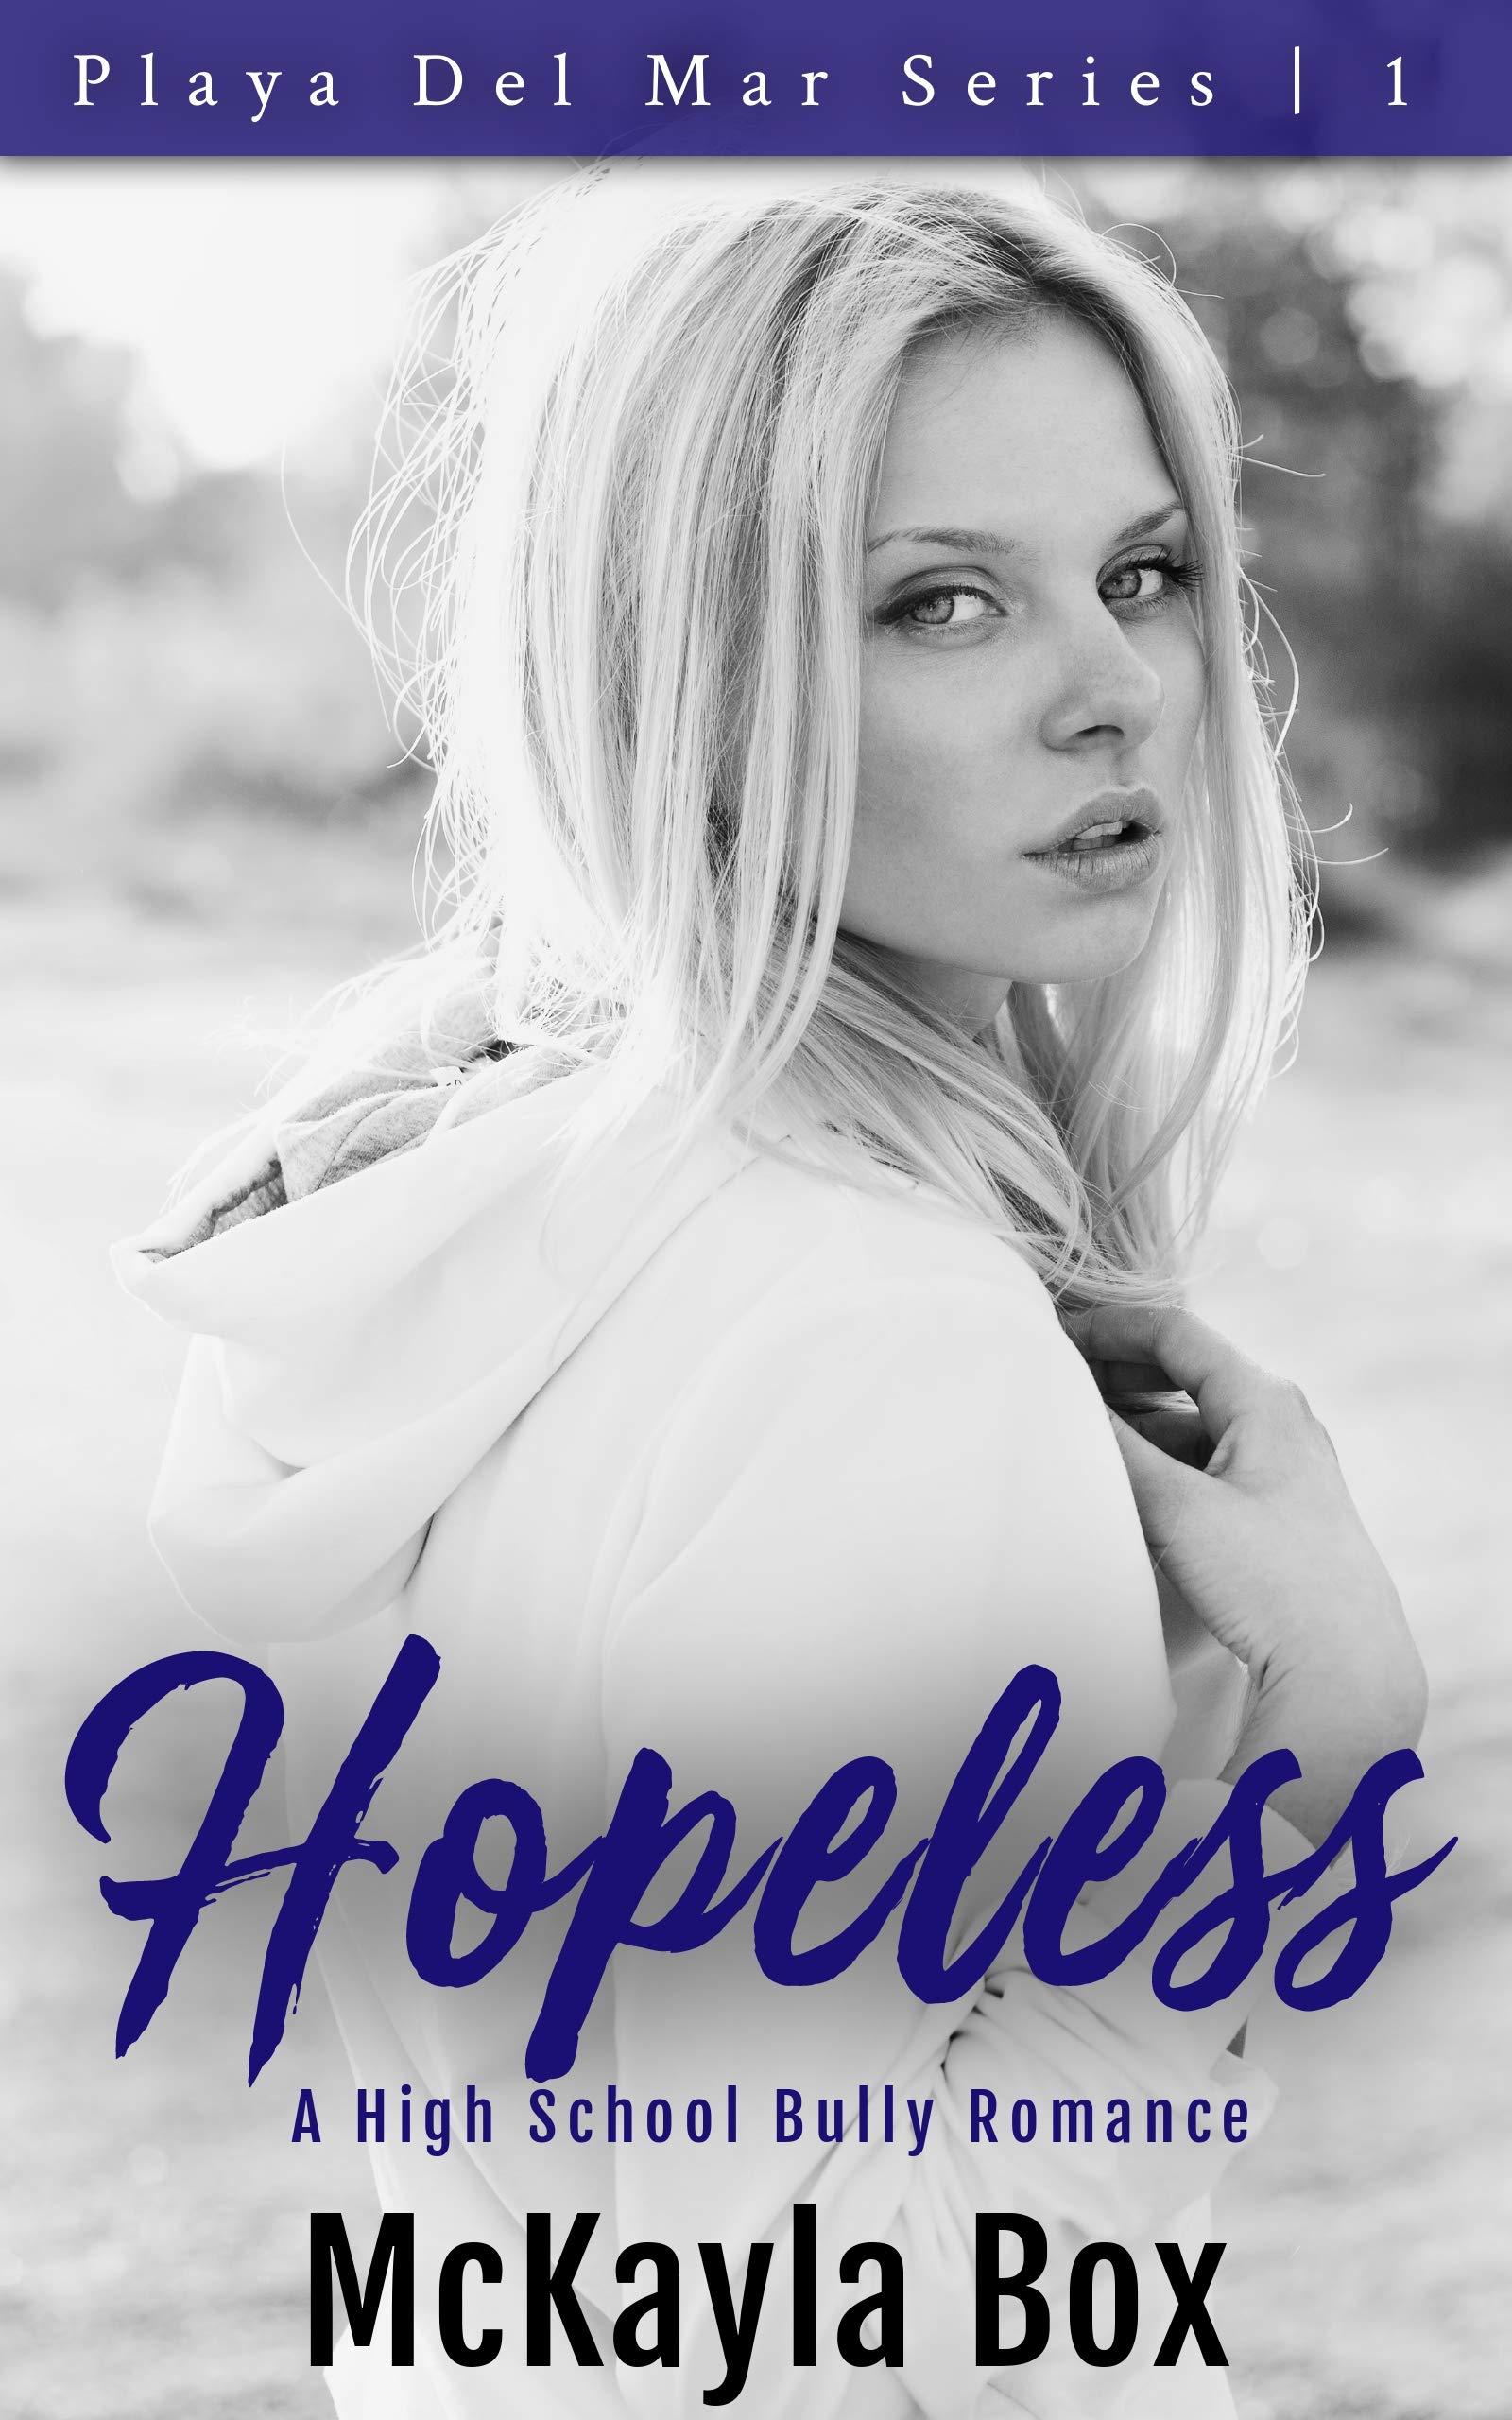 Hopeless: A High School Bully Romance (Playa Del Mar Book 1)